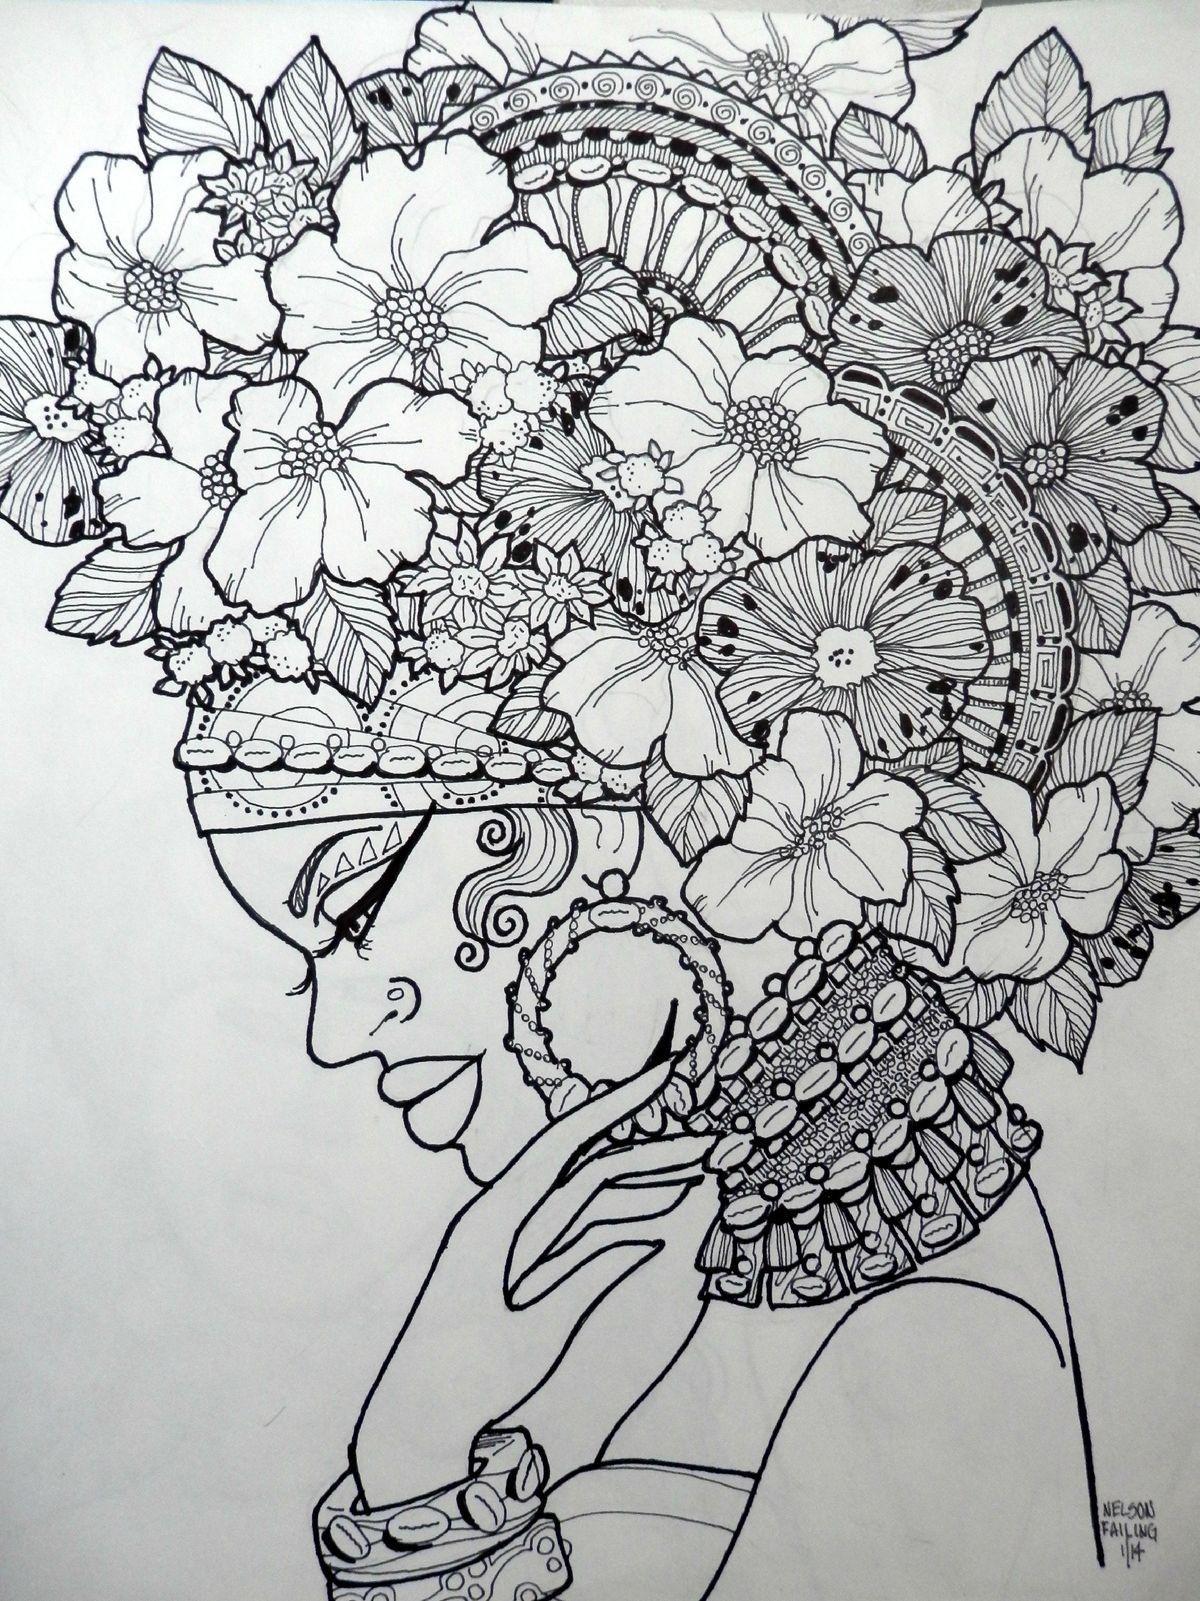 Pin de Roser Miller en Colorear | Pinterest | Pinturas y Arte